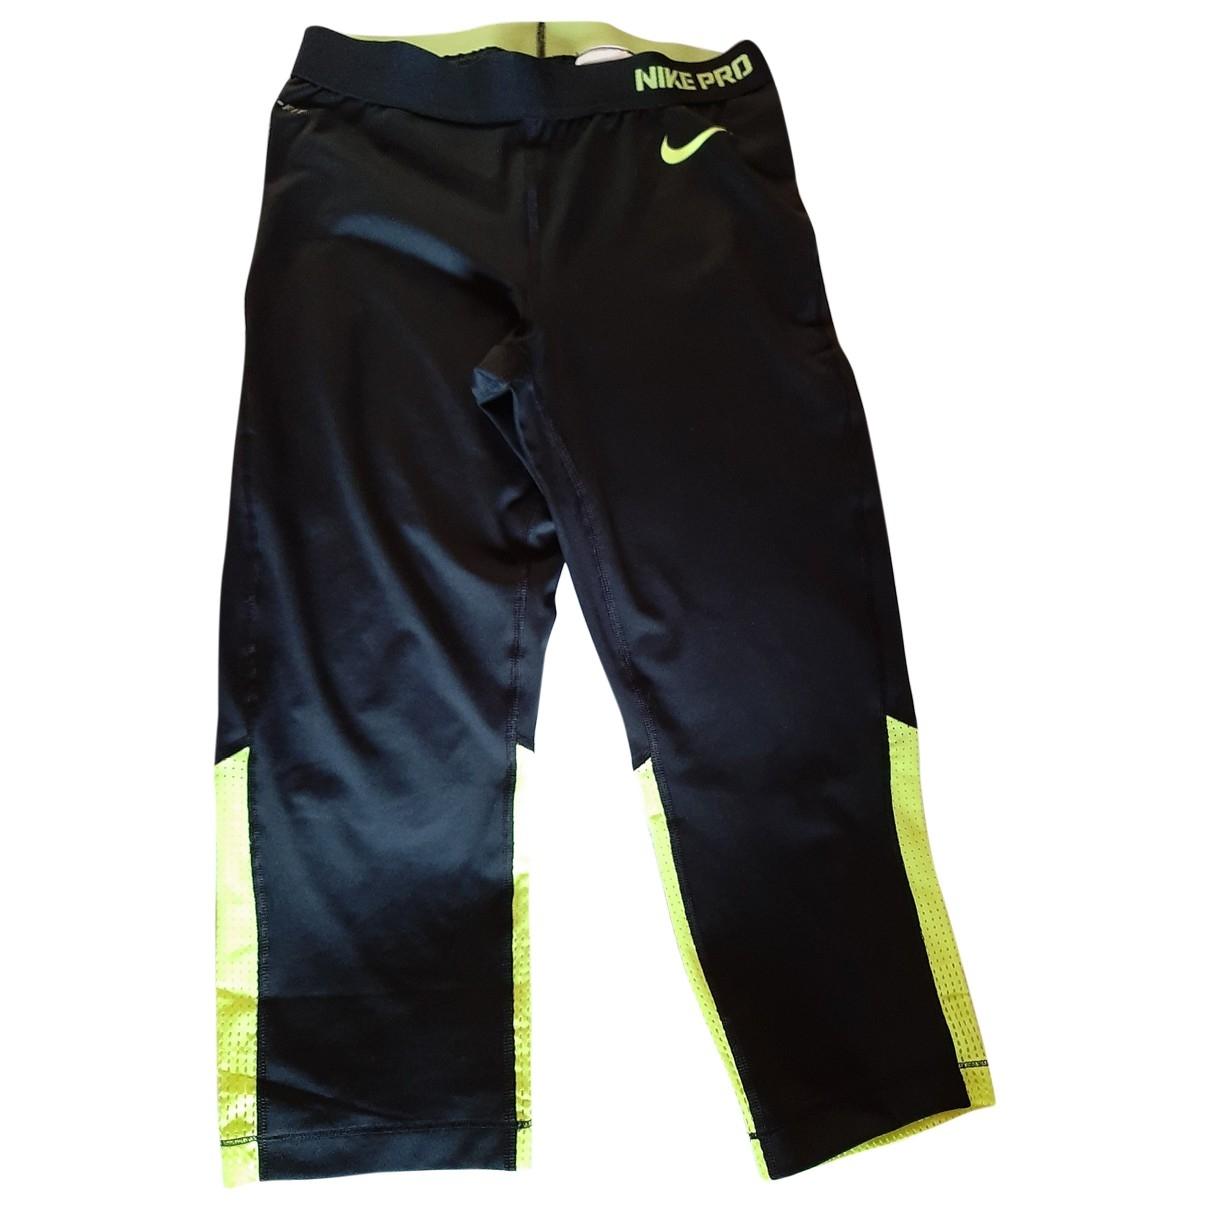 Nike \N Hose in  Schwarz Polyester